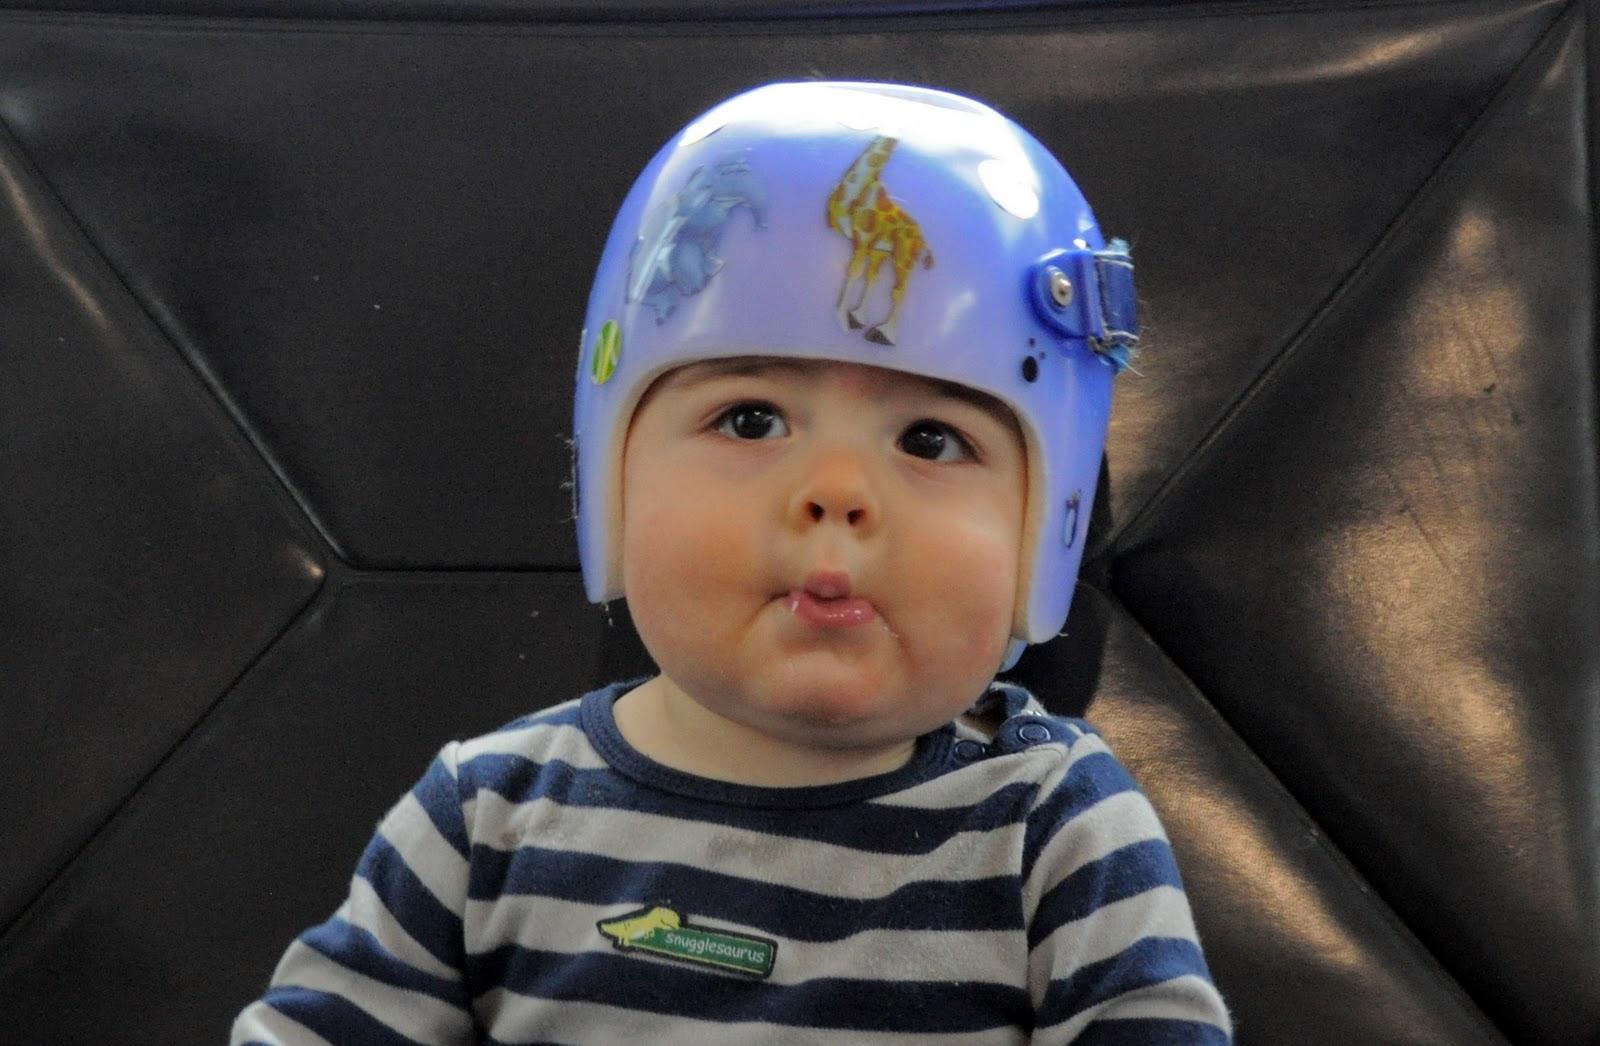 http://1.bp.blogspot.com/_Ph0Z7XGUoiA/TOnypJUreEI/AAAAAAAAAdo/68f6erUzjIw/s1600/Finn+Funny+Face.jpg